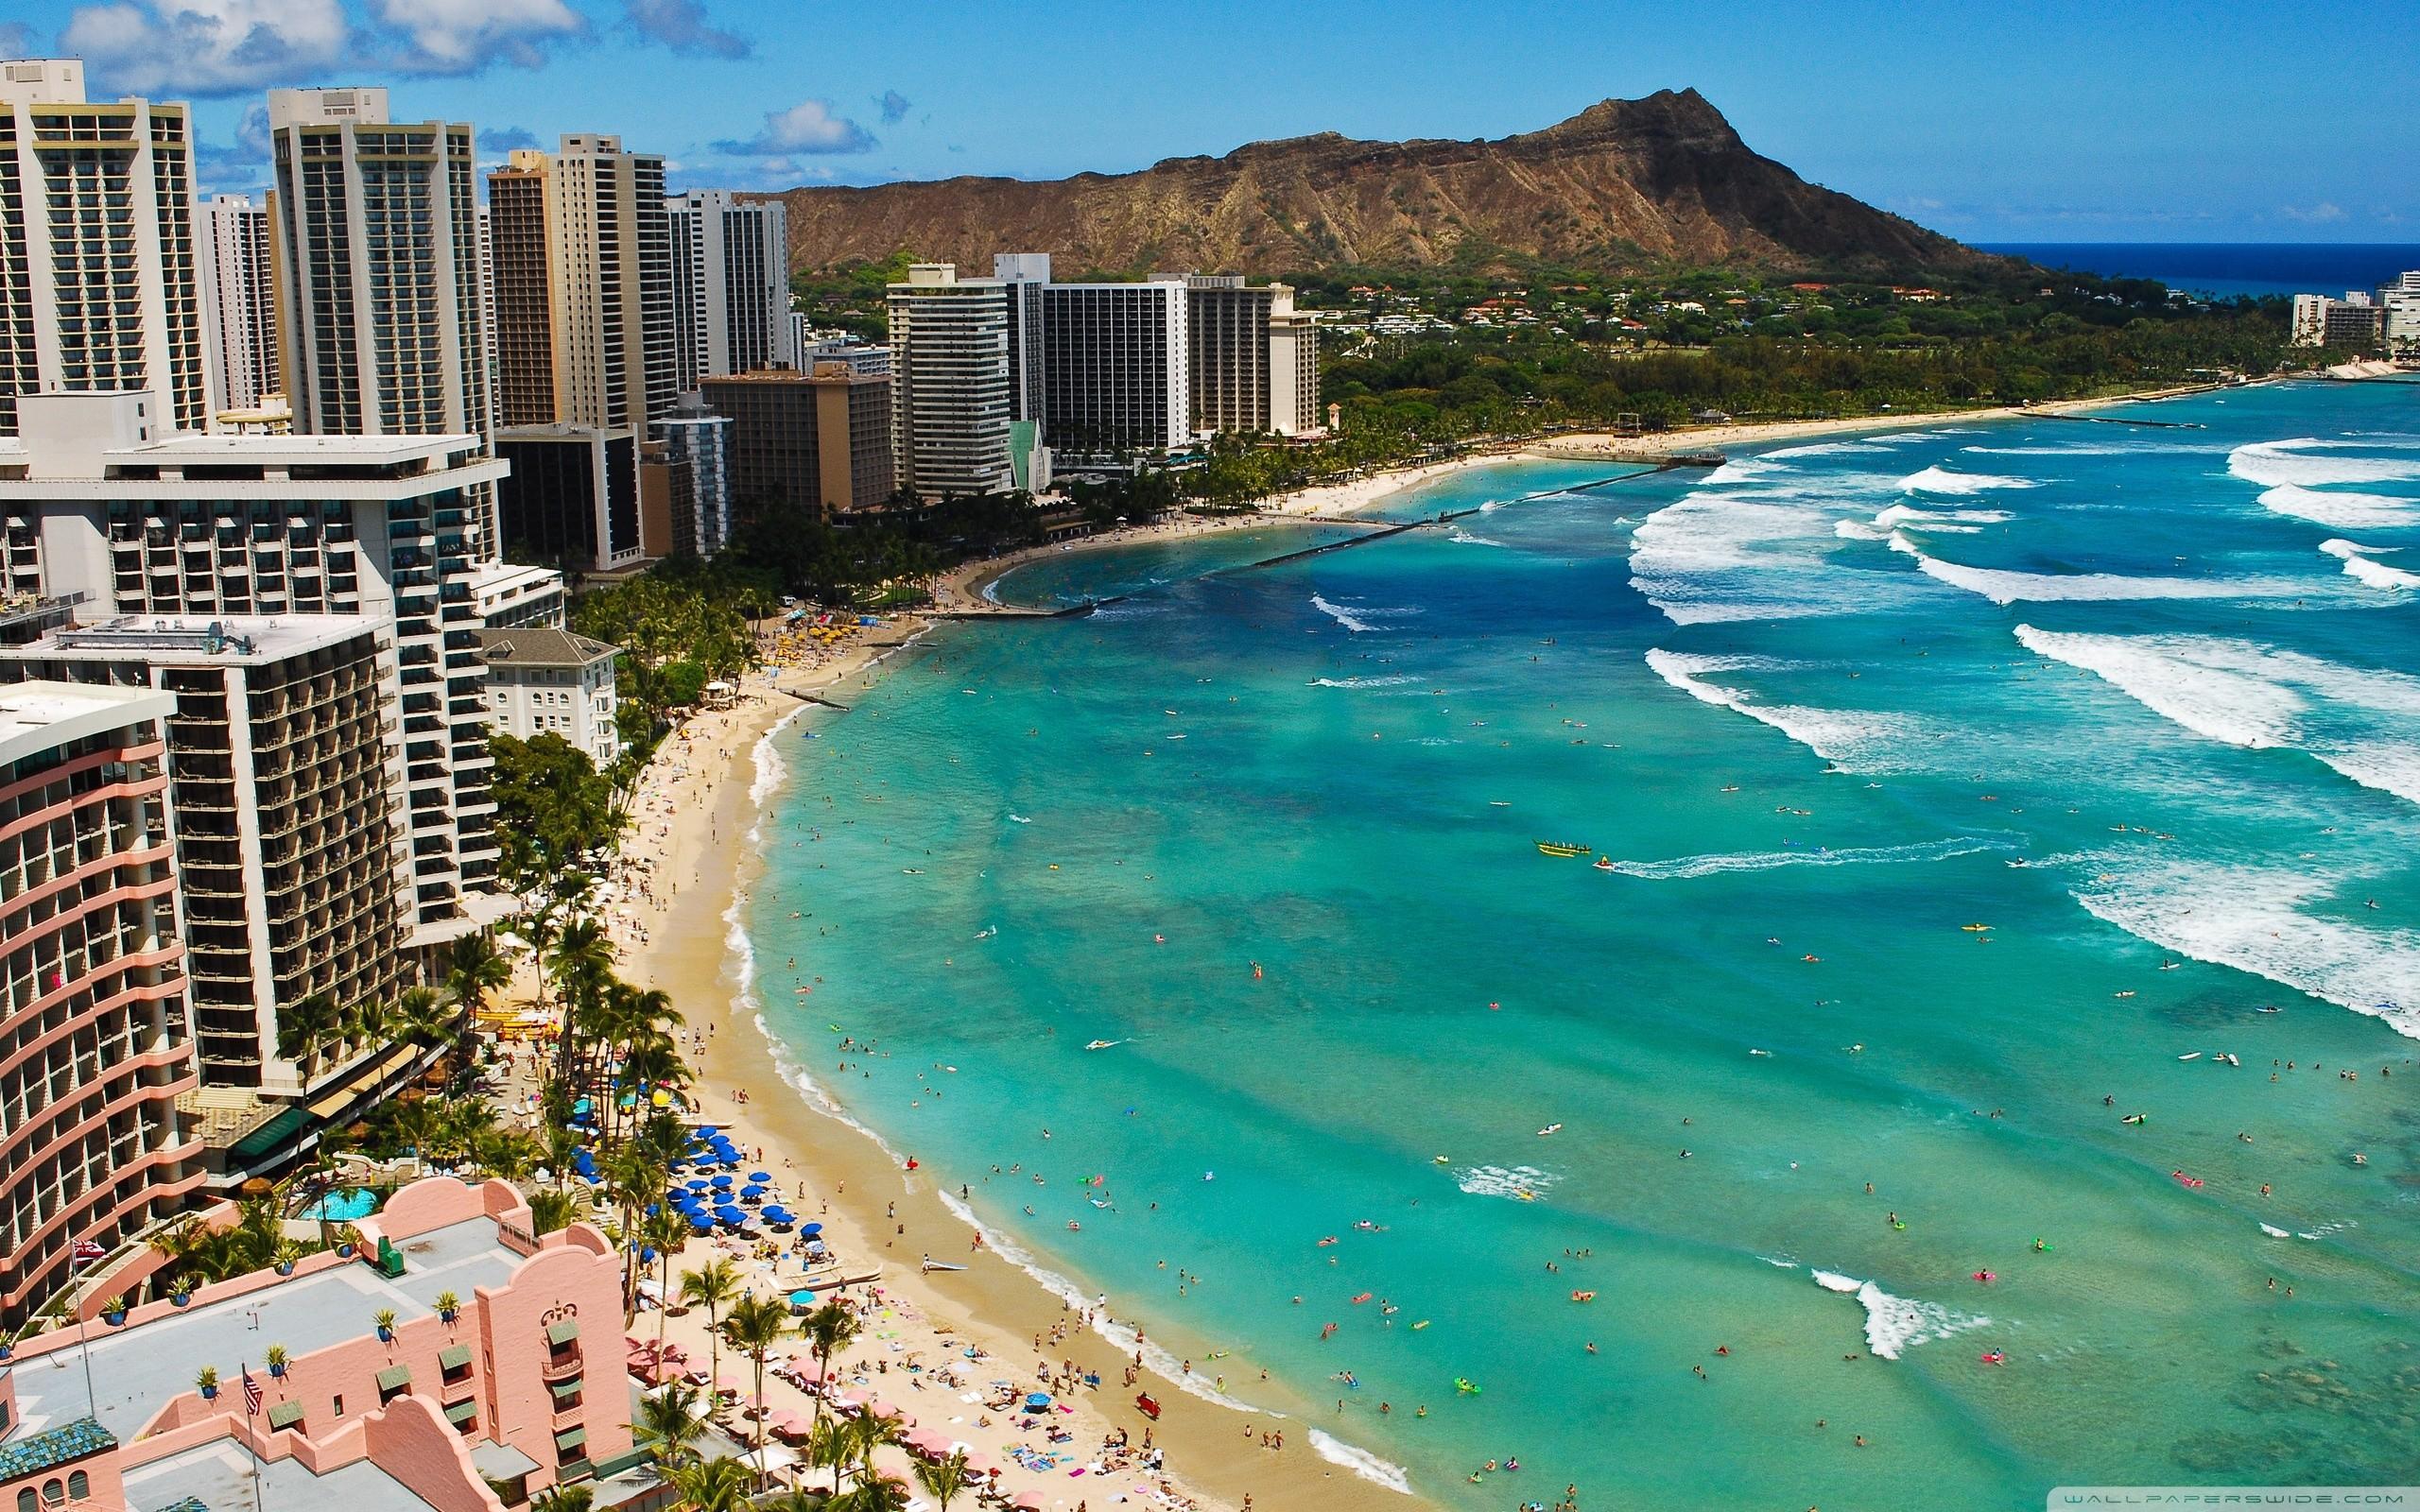 61 Waikiki Beach Wallpapers on WallpaperPlay 2560x1600